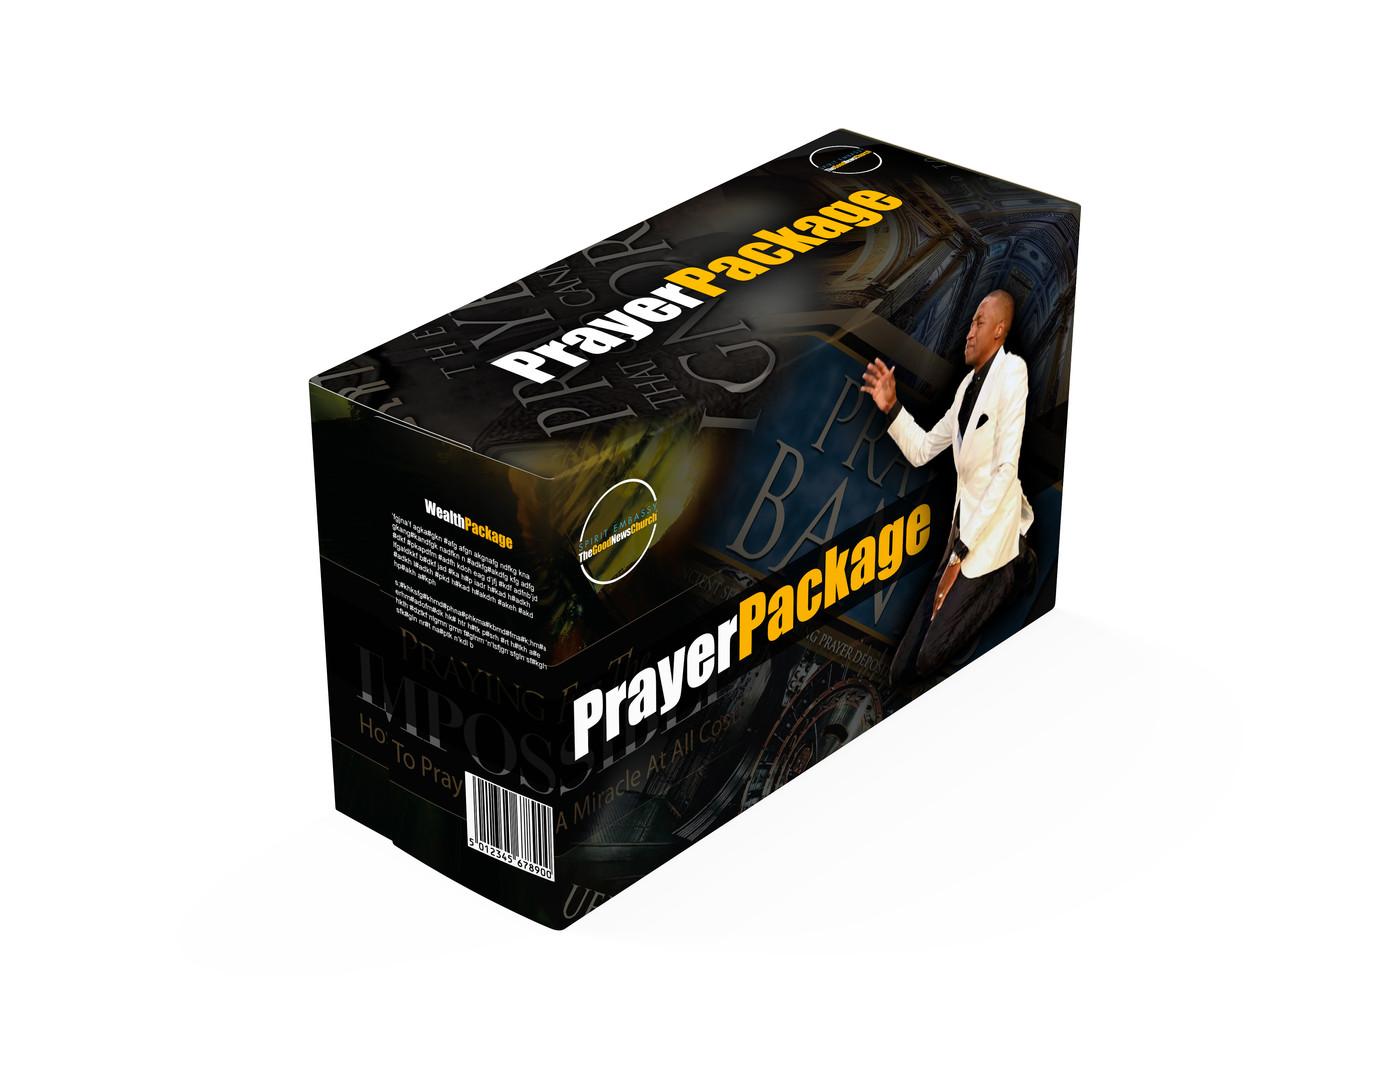 Prayer package 1 3d.jpg